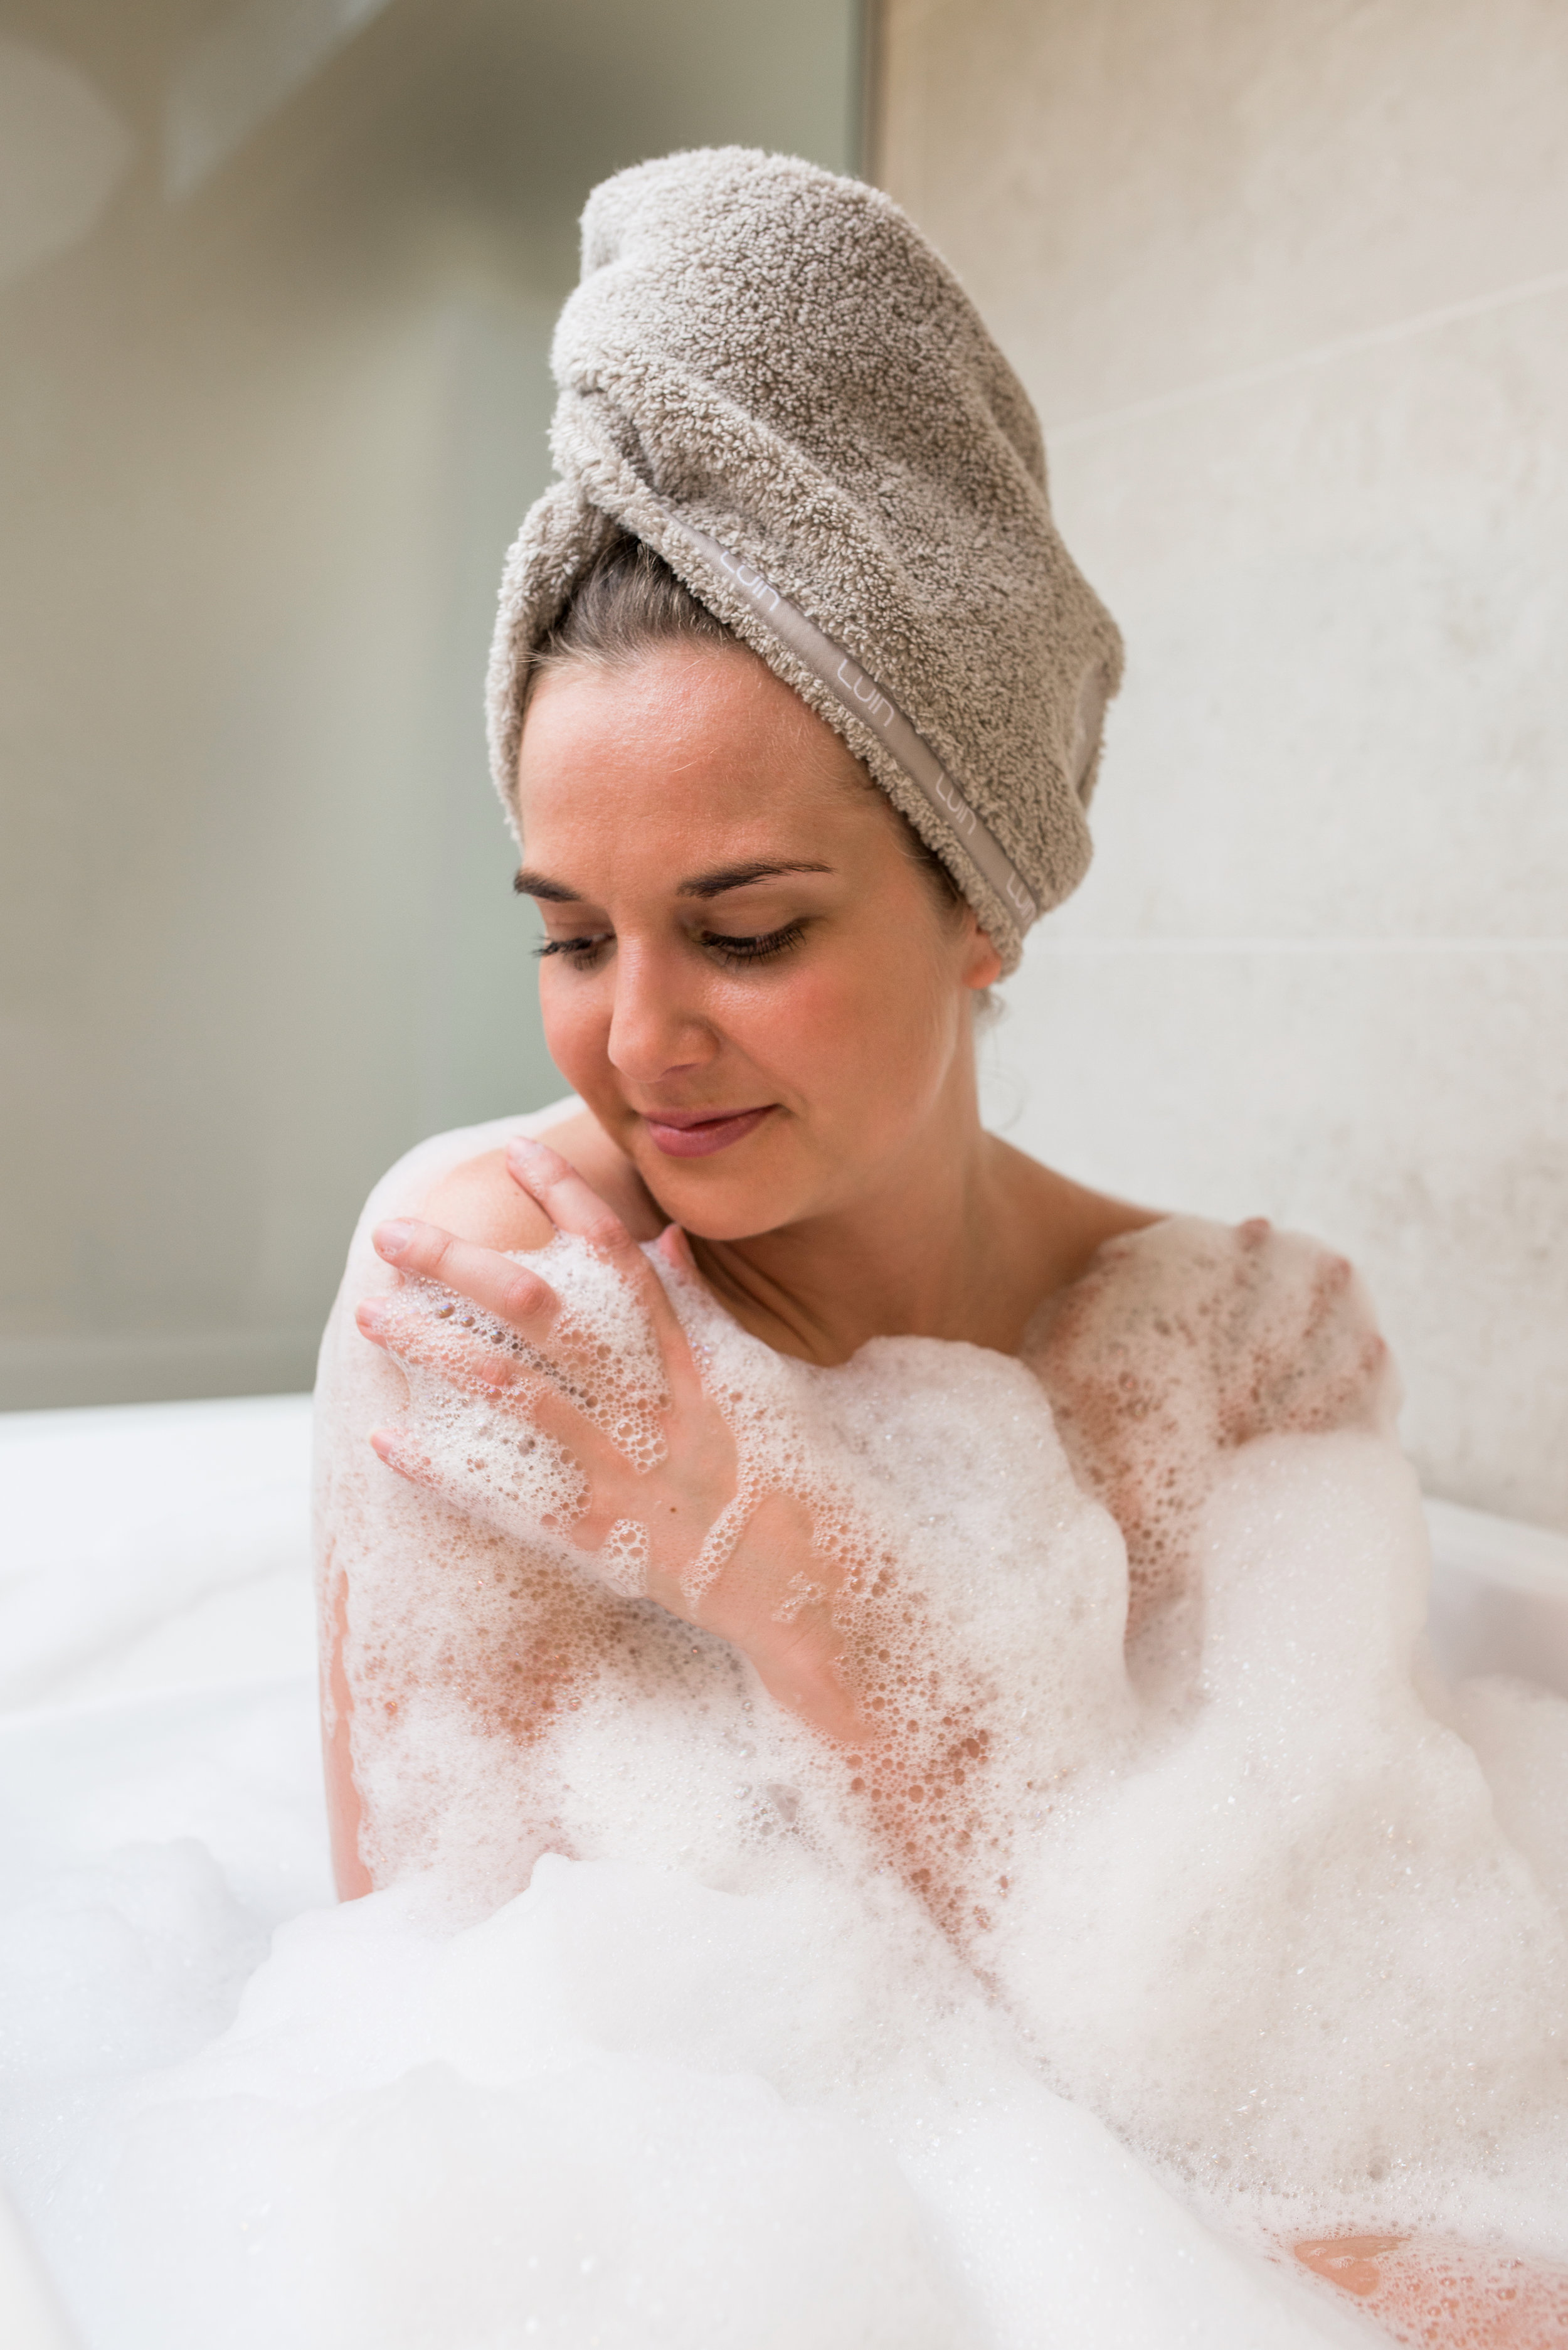 Hair Towel Sand 4.jpg